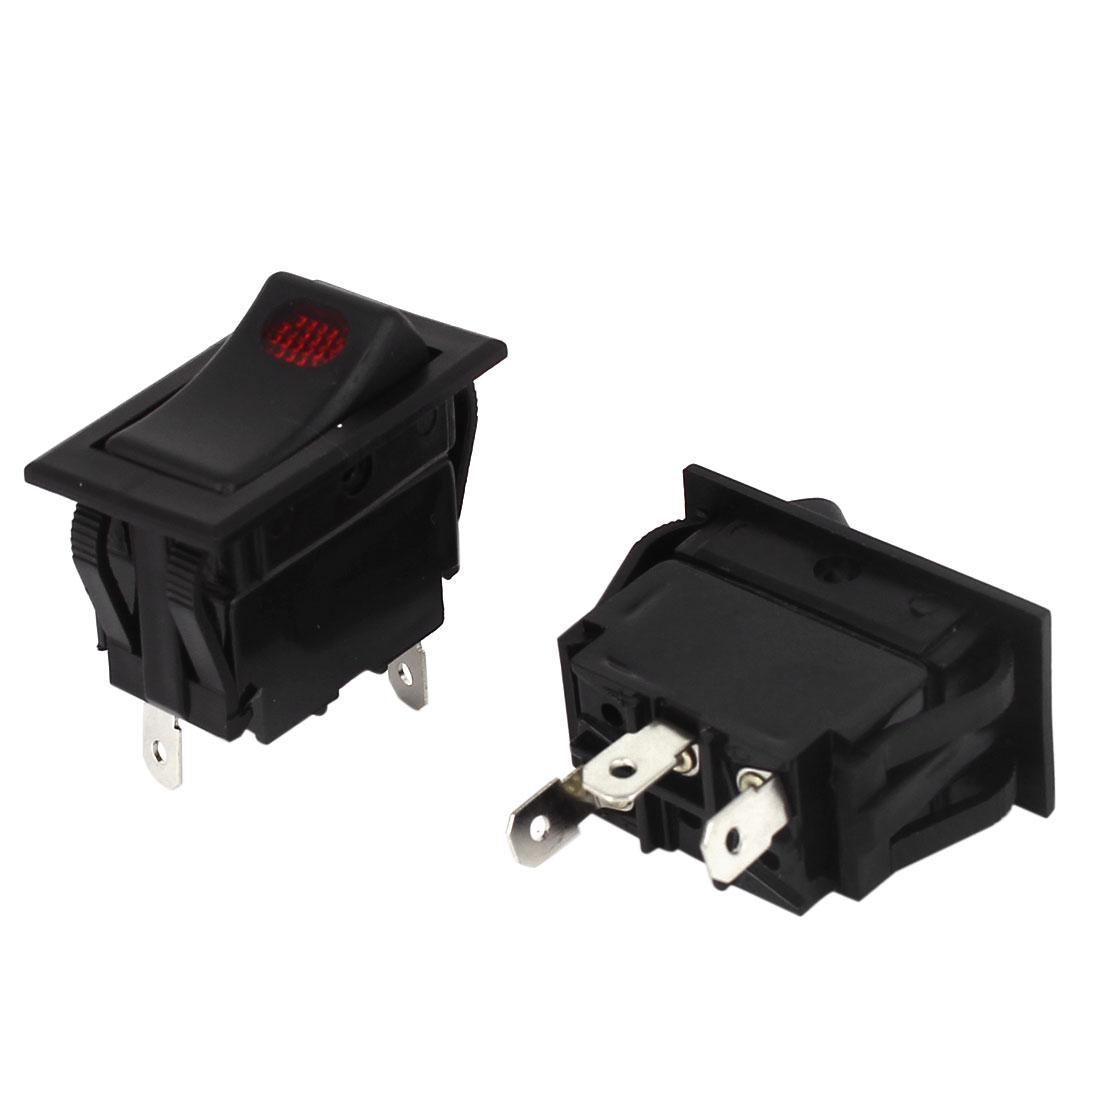 Switches Control 12V 35A Auto HeadLight Rocker Switch 3 Pins 2 Pcs